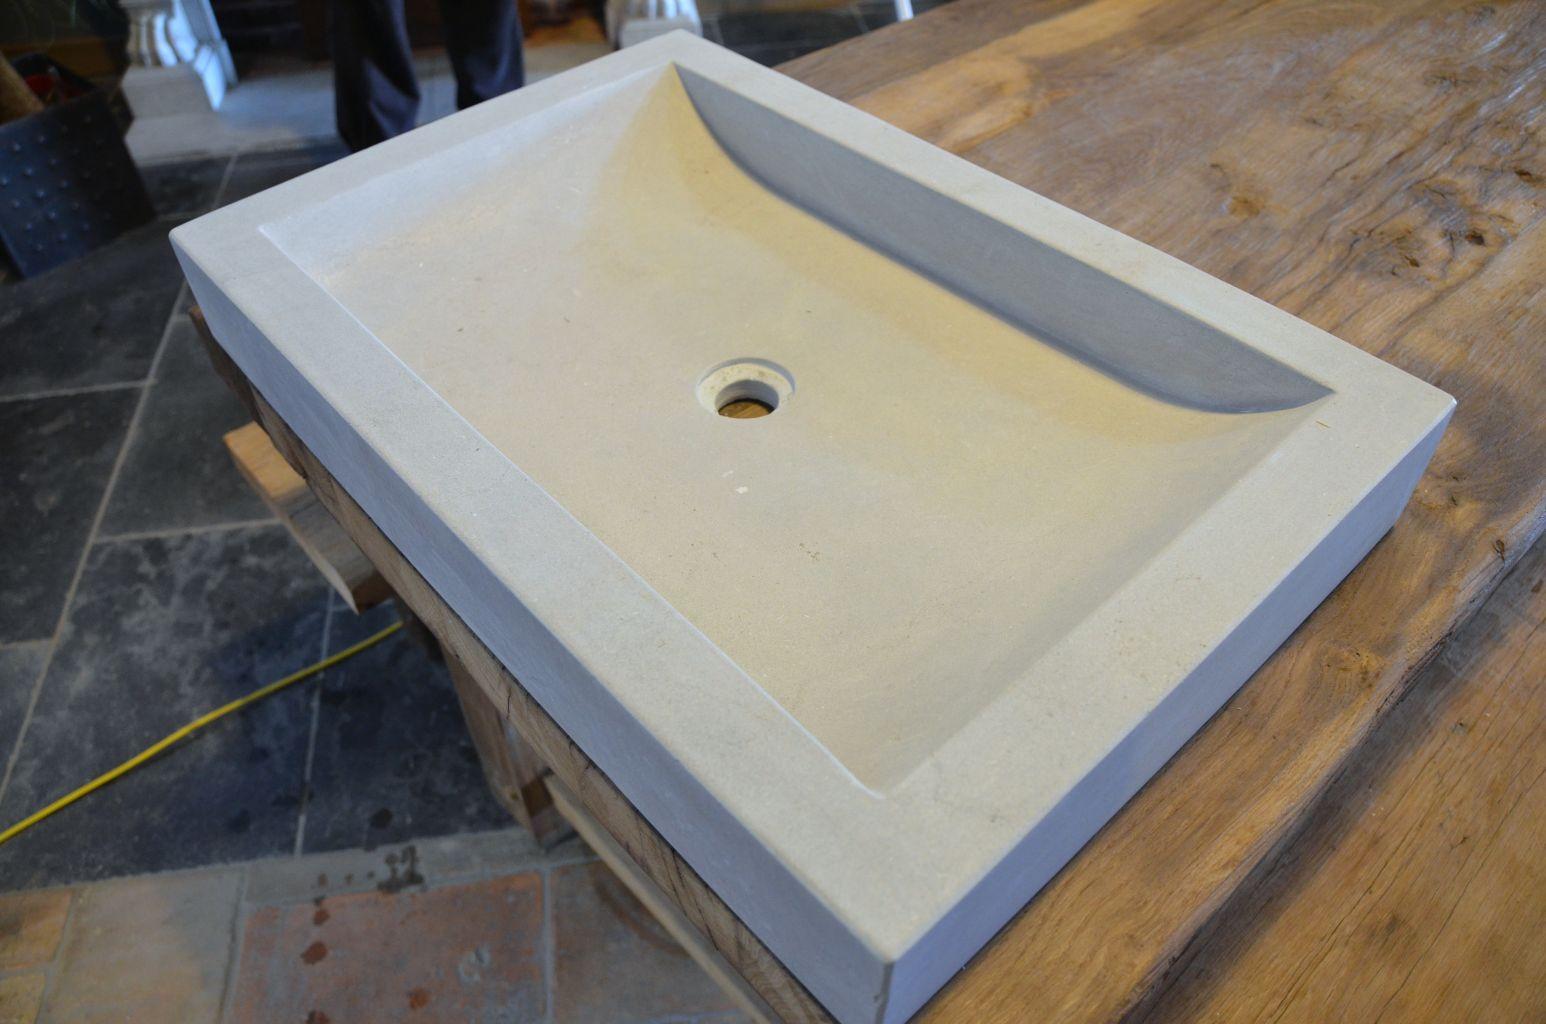 evier pierre naturelle beige rectangulaire bca. Black Bedroom Furniture Sets. Home Design Ideas